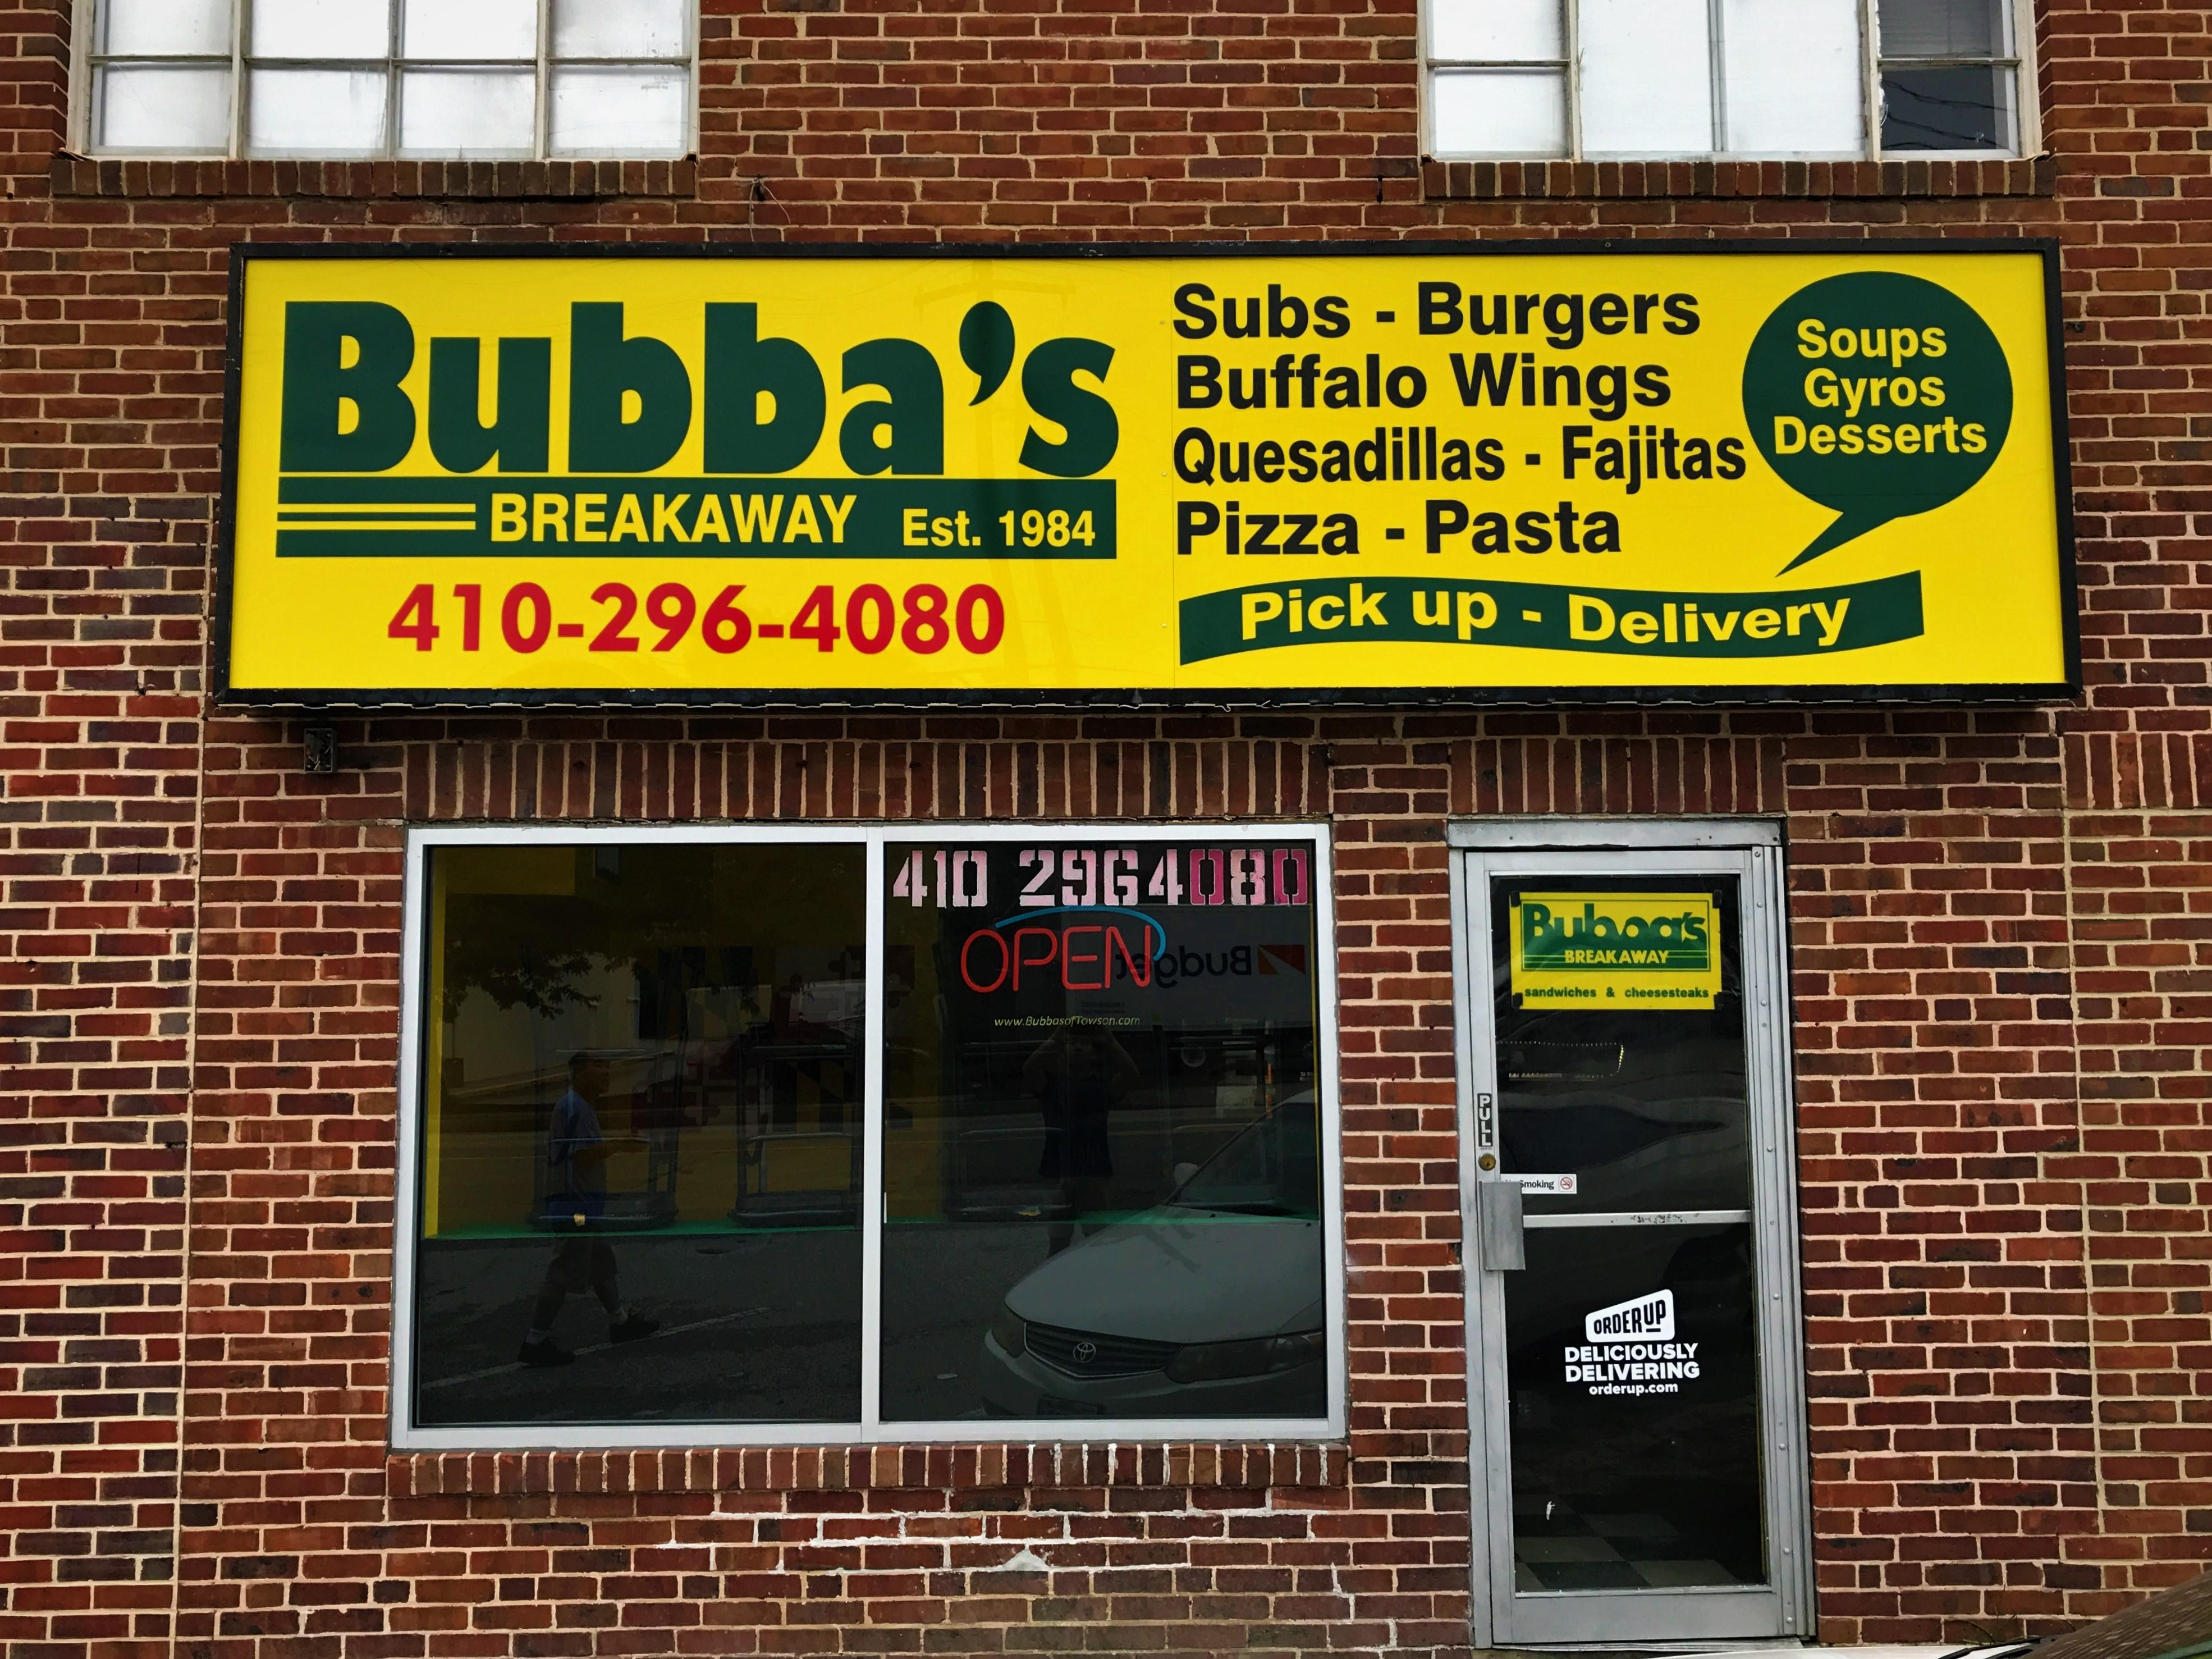 Bubba's Breakaway